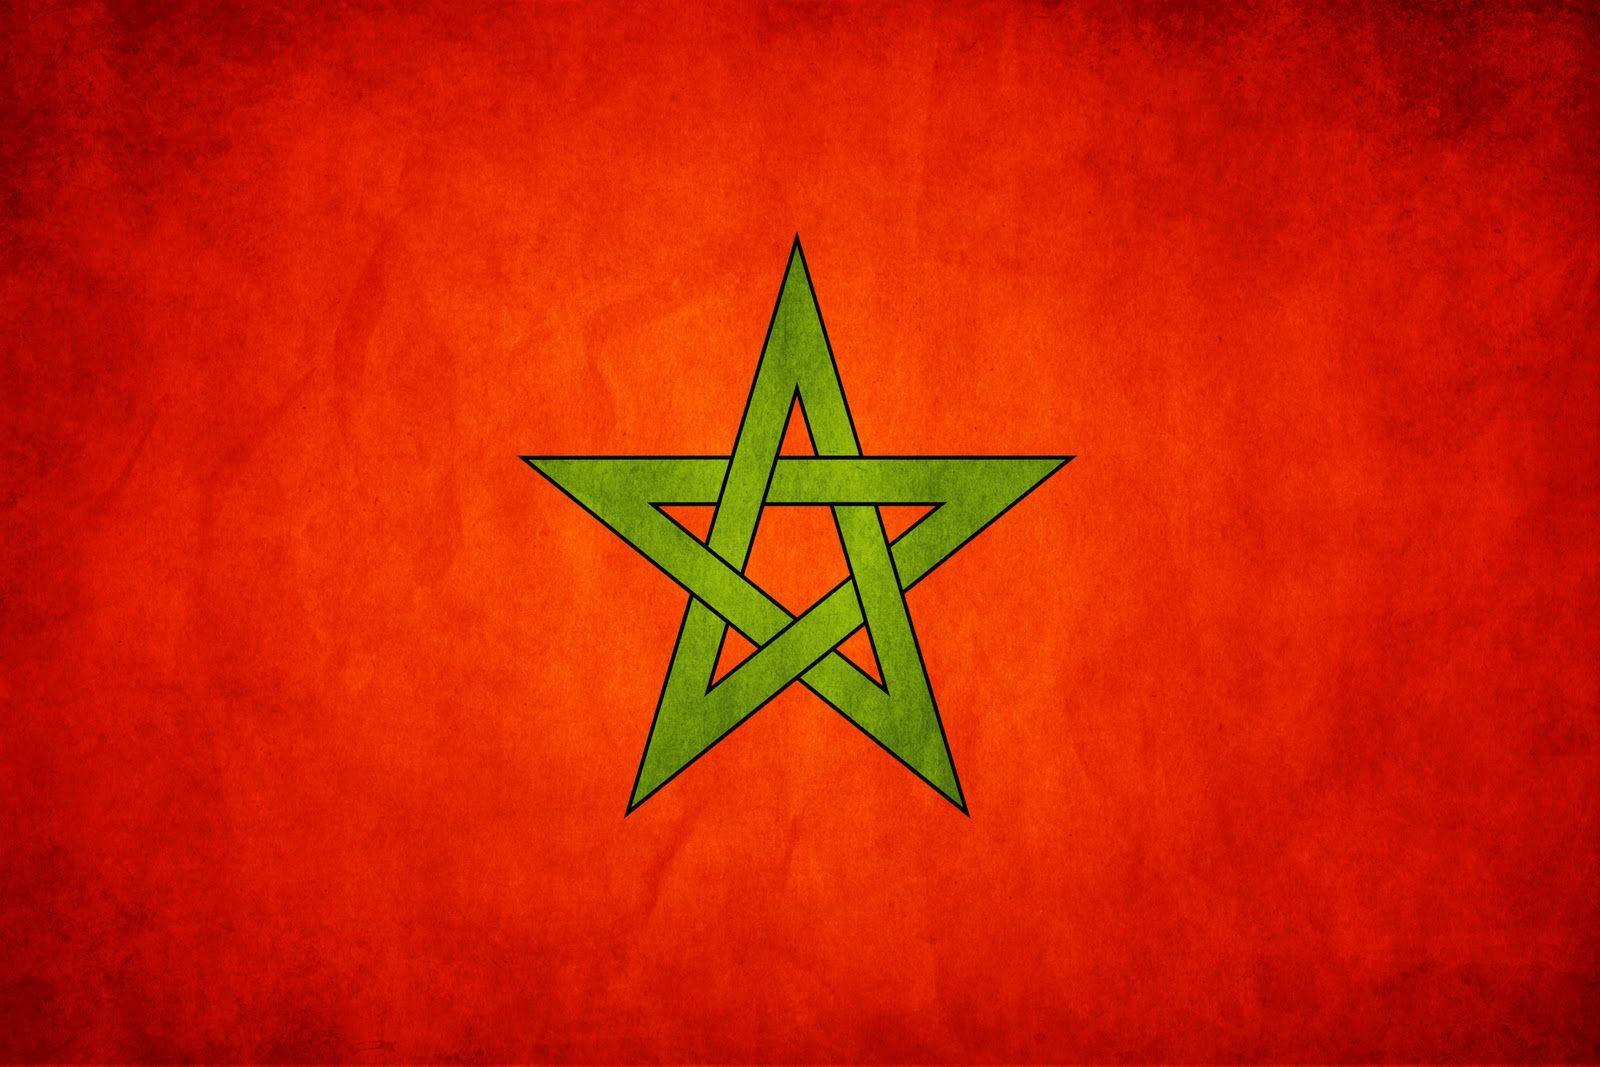 Morroccan Flag Marokko Flagge Marokko Flaggen